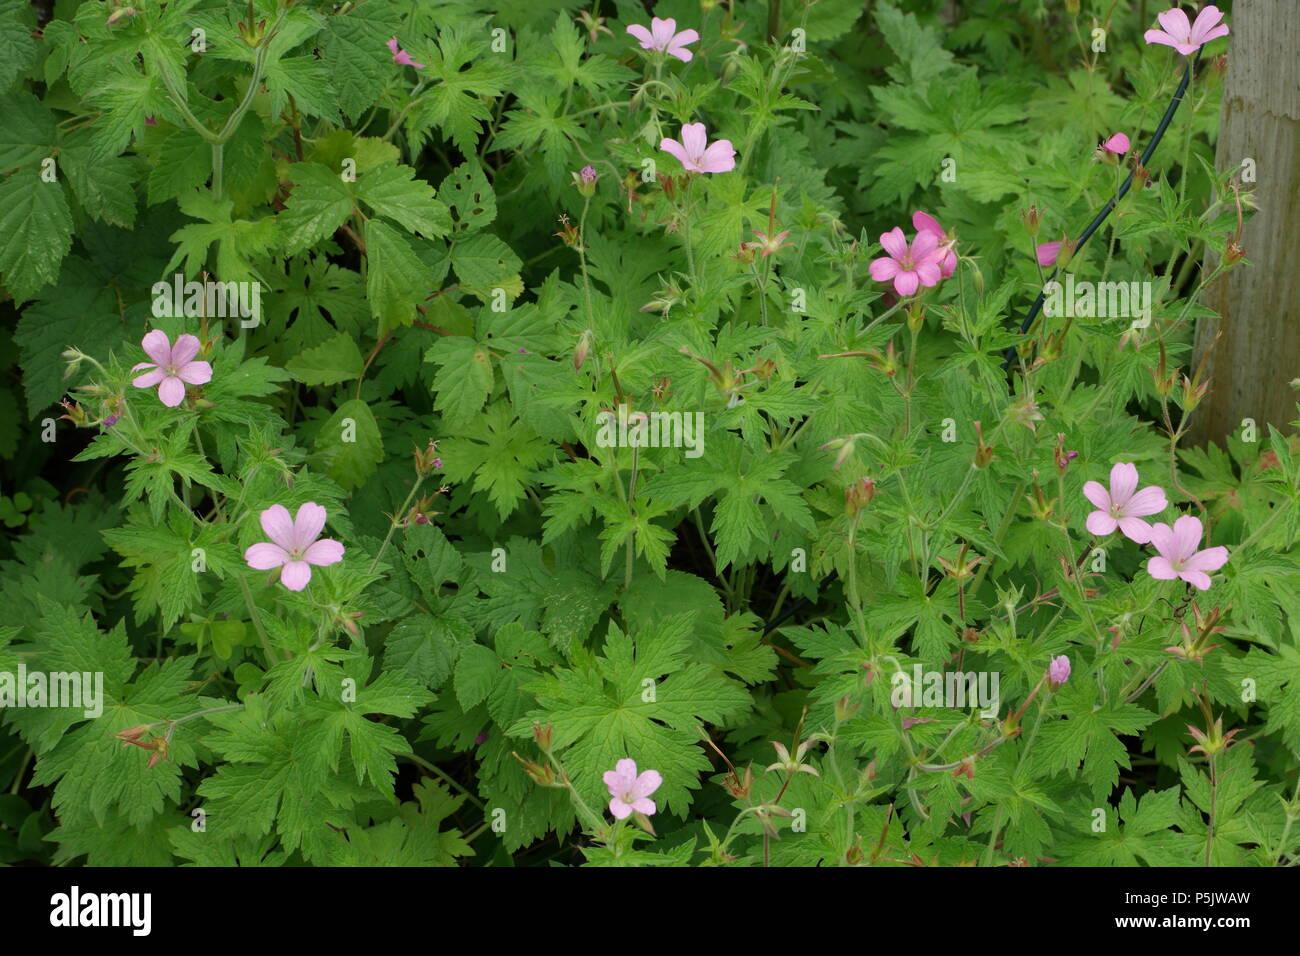 Geranium endressii / Endress Cranesbill / Basken-Storchschnabel - Stock Image